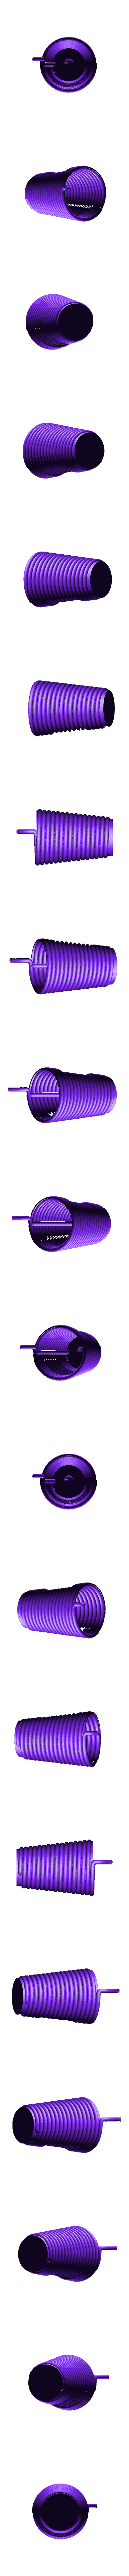 straw-glass-practical.stl Download free STL file Big StrawGlass - Practical • 3D print design, bLiTzJoN